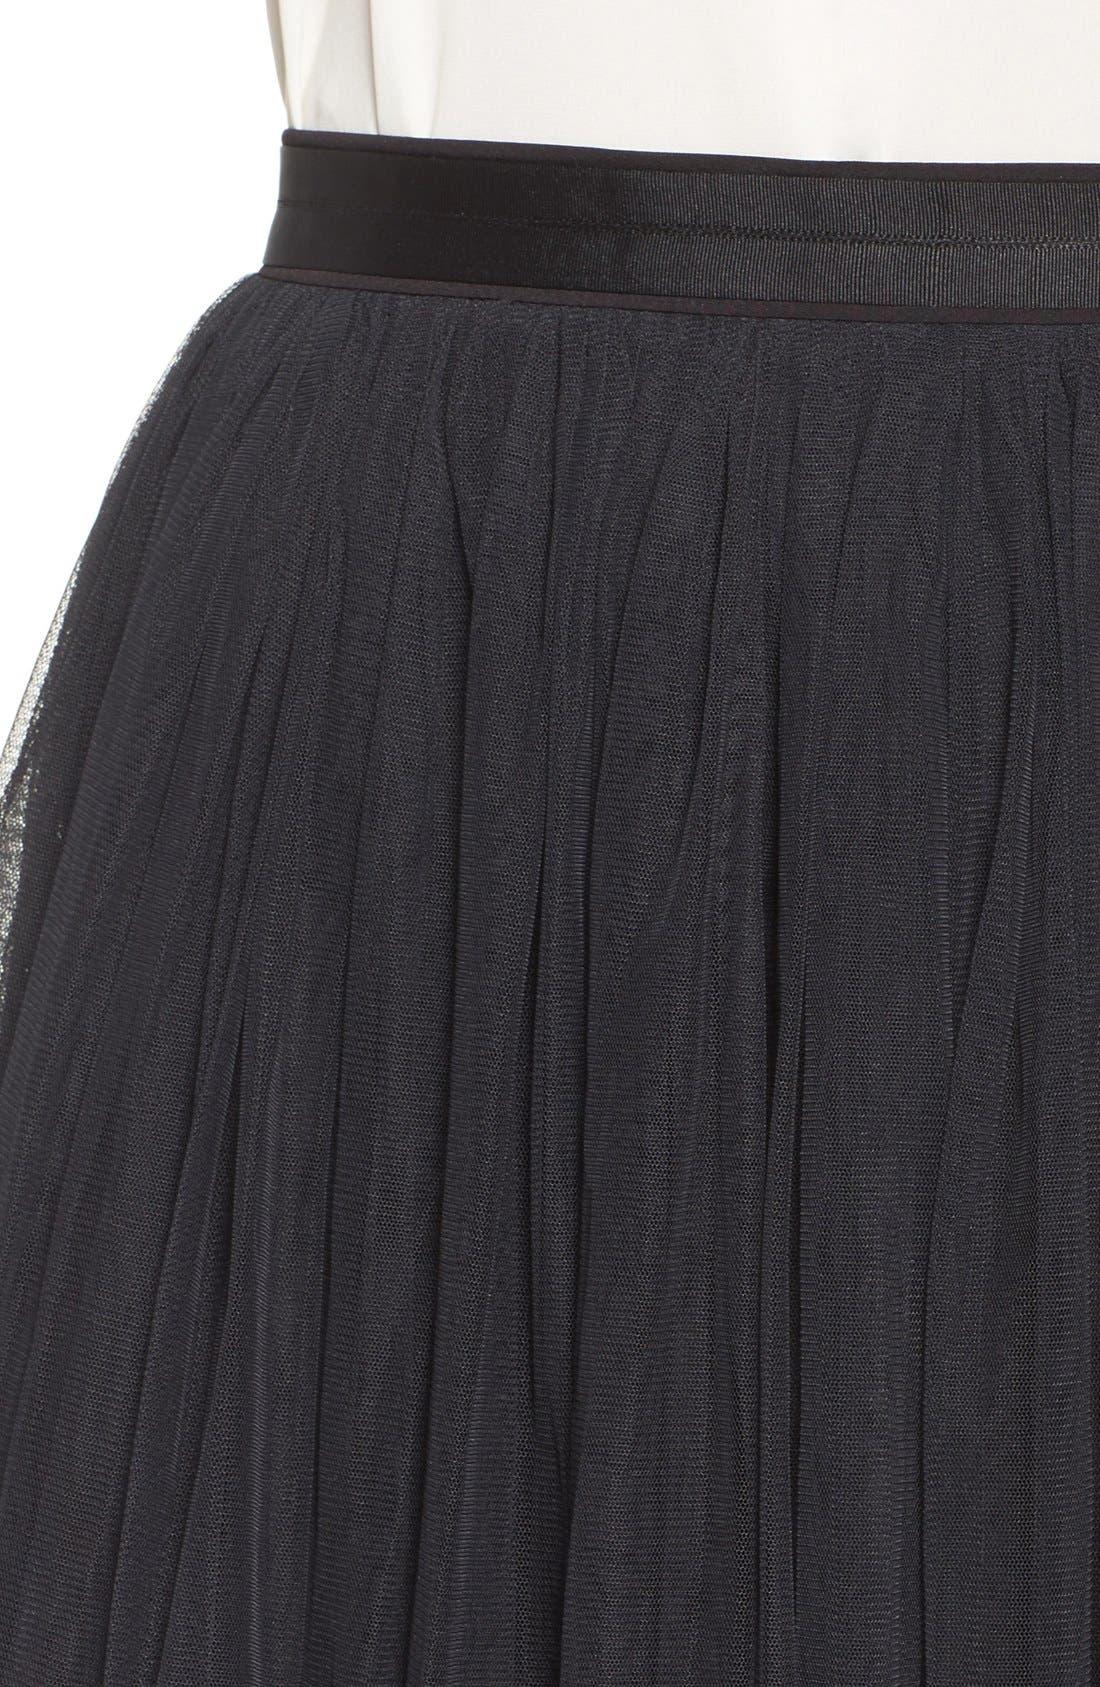 Alternate Image 5  - Needle & Thread Tulle Skirt